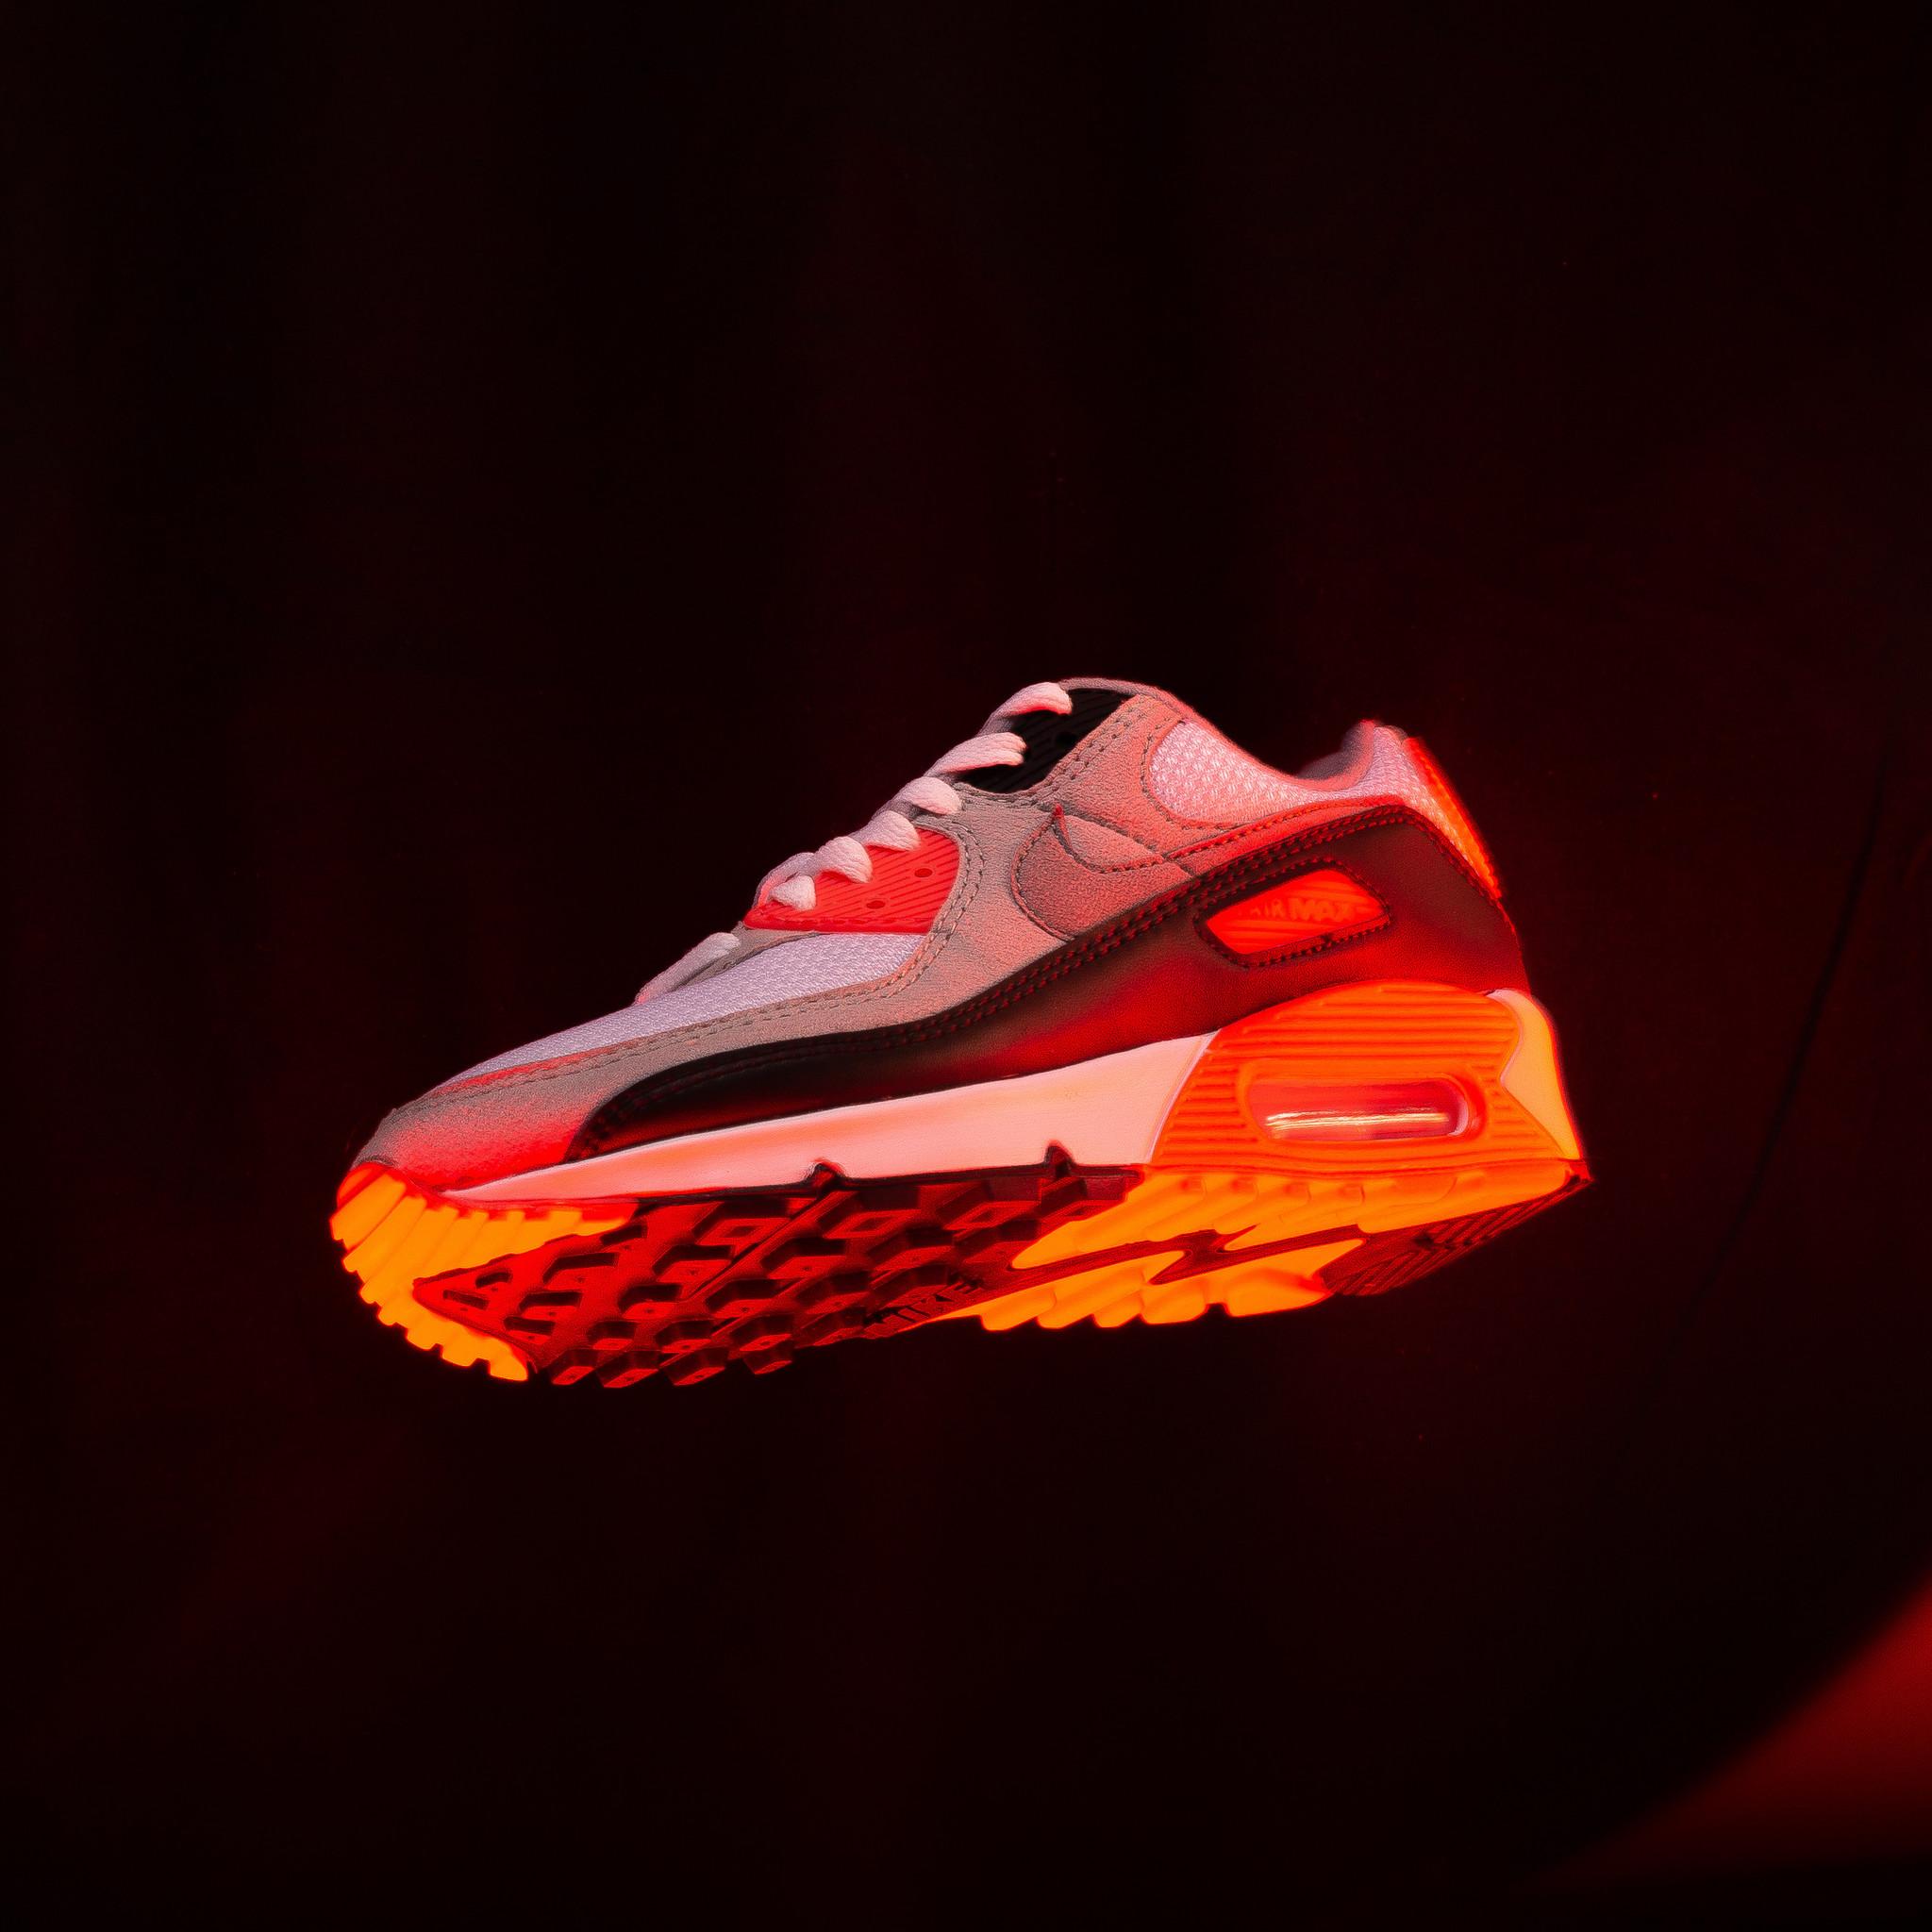 Nike Nike Air Max 90 Infrared